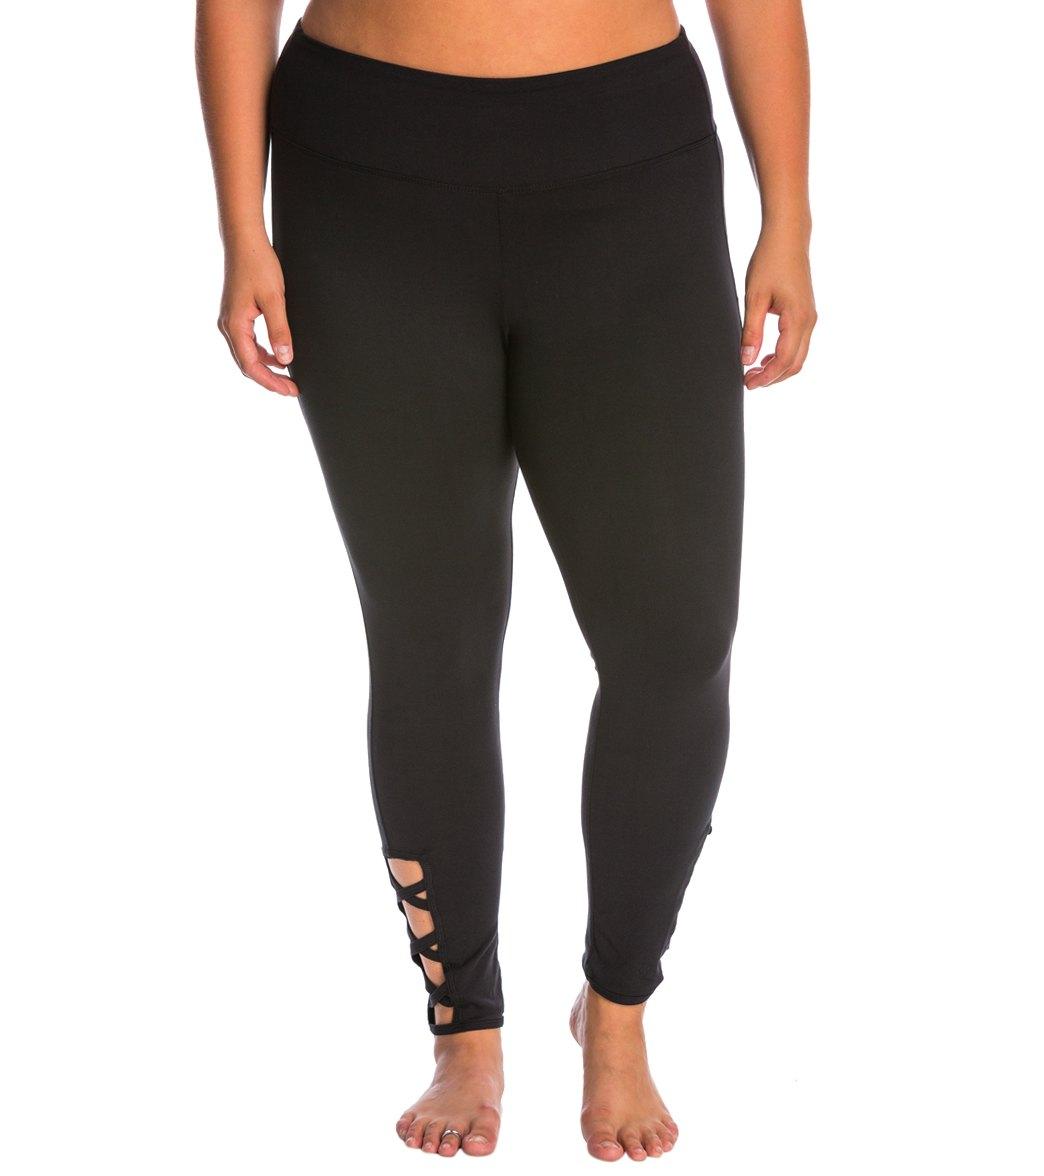 e5015bea1cacb5 Balance Collection Plus Size Lexi Fashion Yoga Leggings at SwimOutlet.com